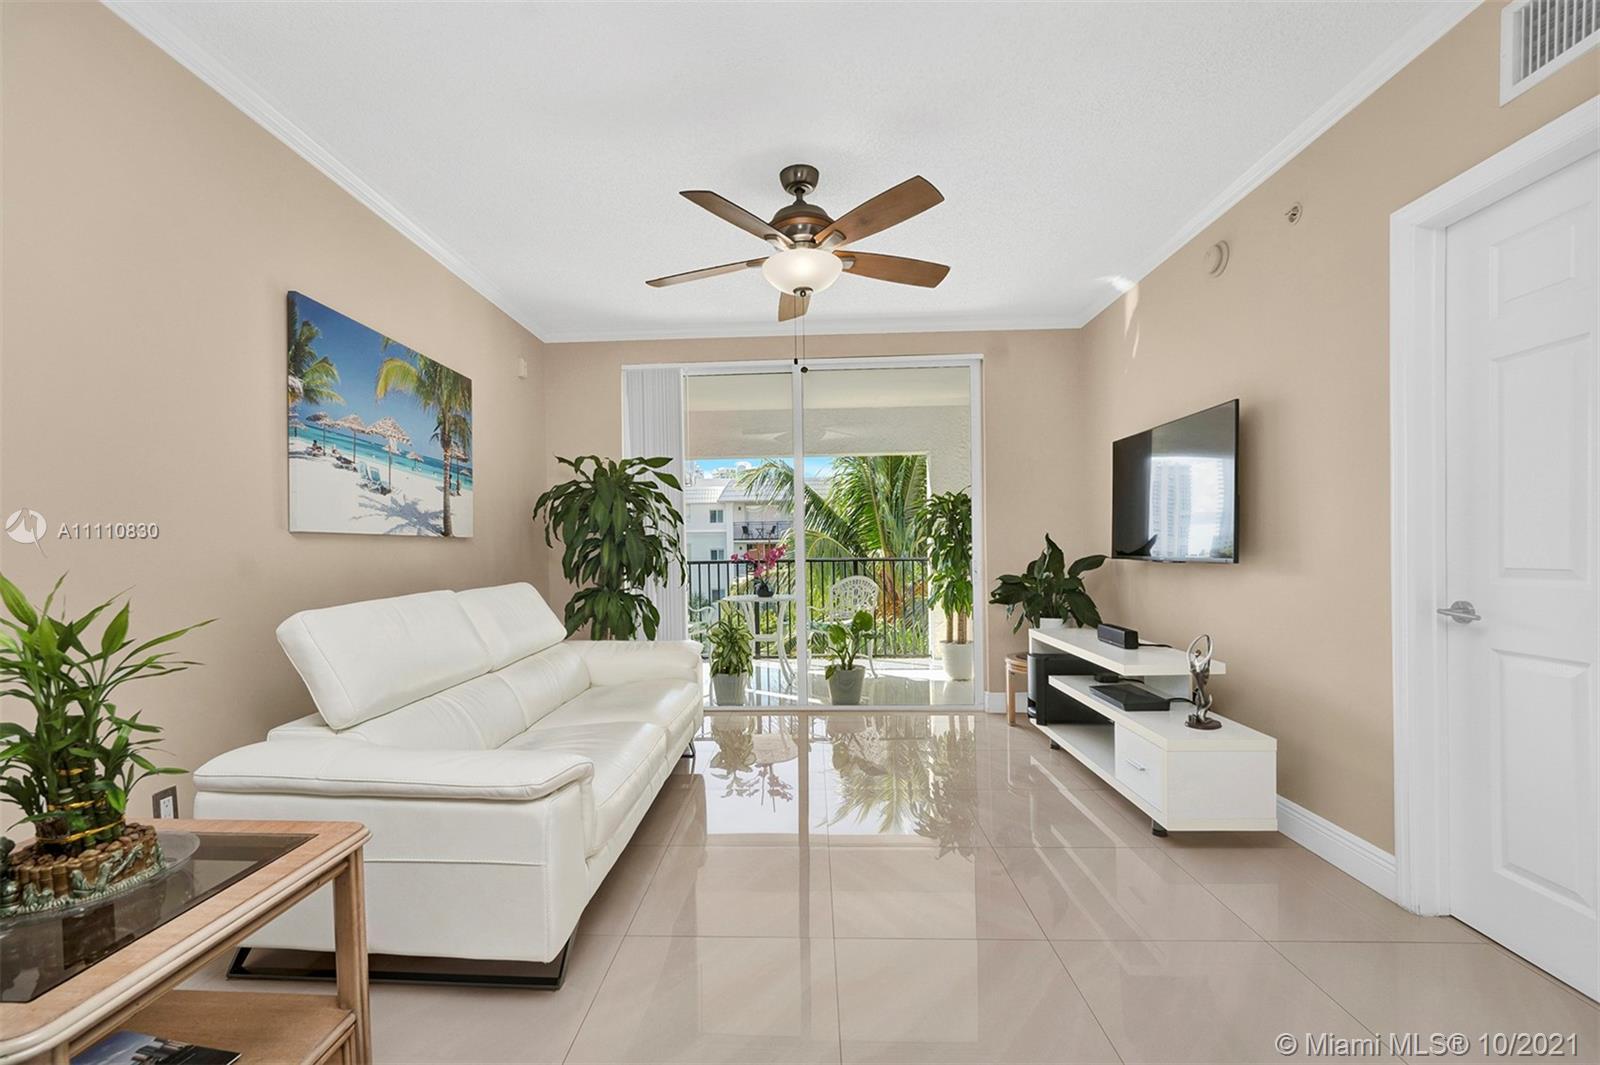 17145 N Bay Rd #4509 For Sale A11110830, FL